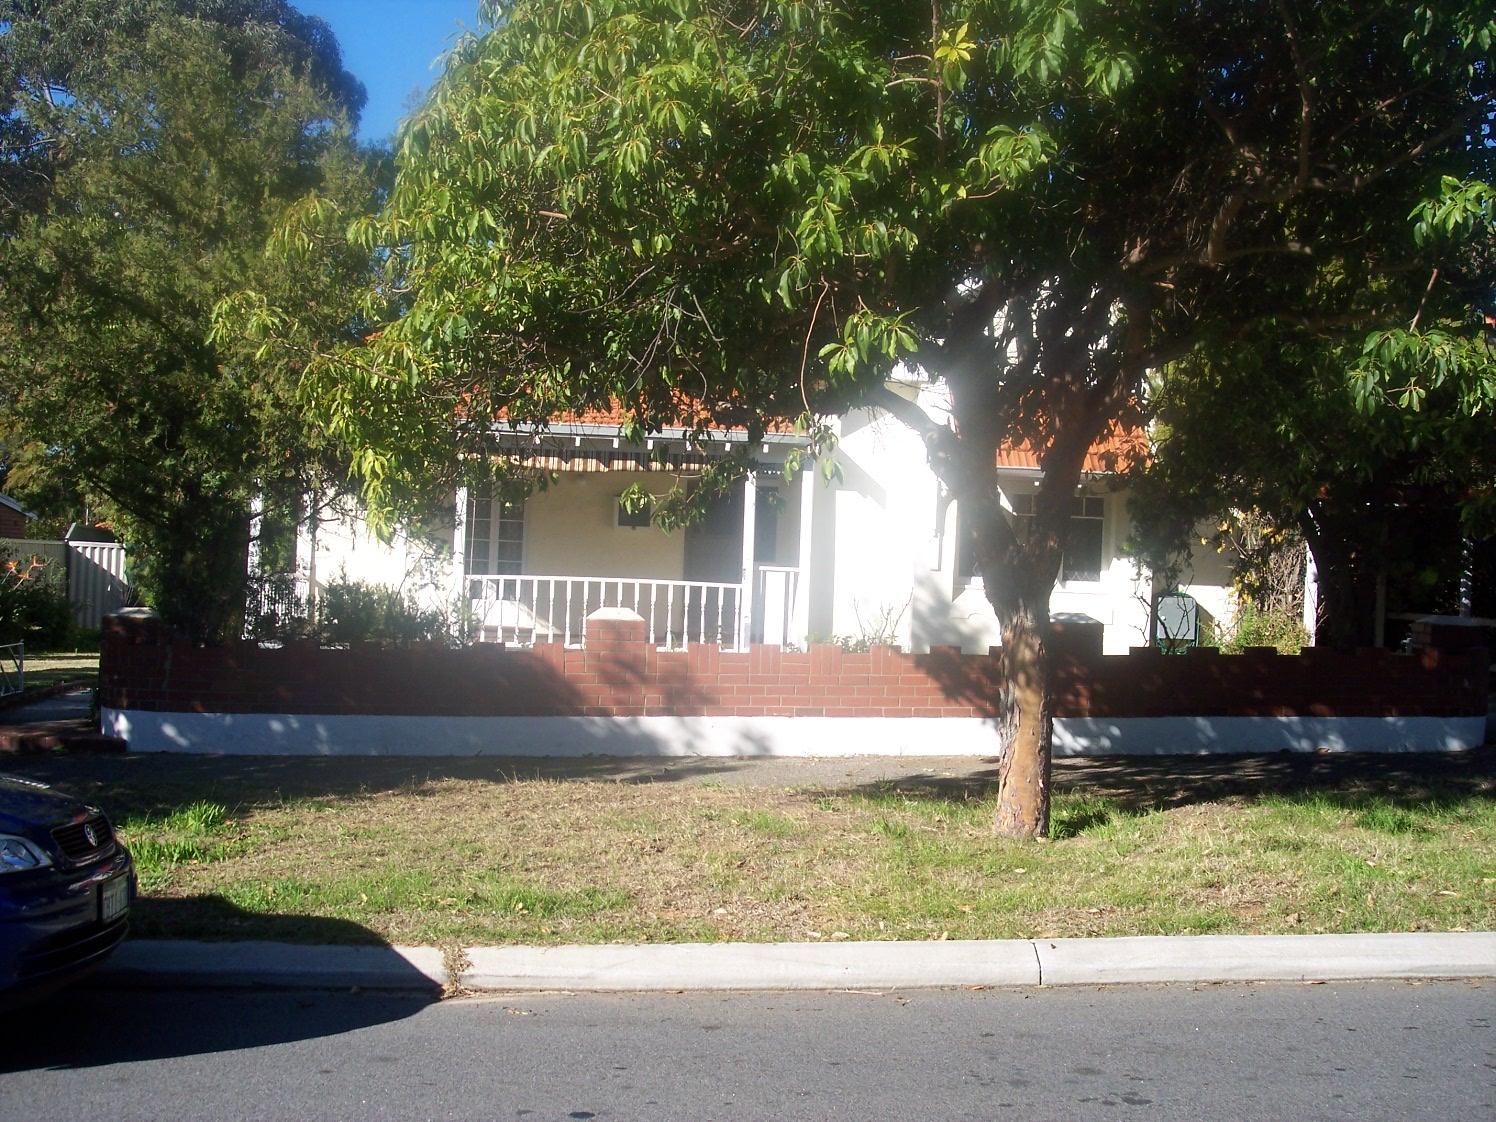 18-7-06 View E 64 Dalgety Street.jpg